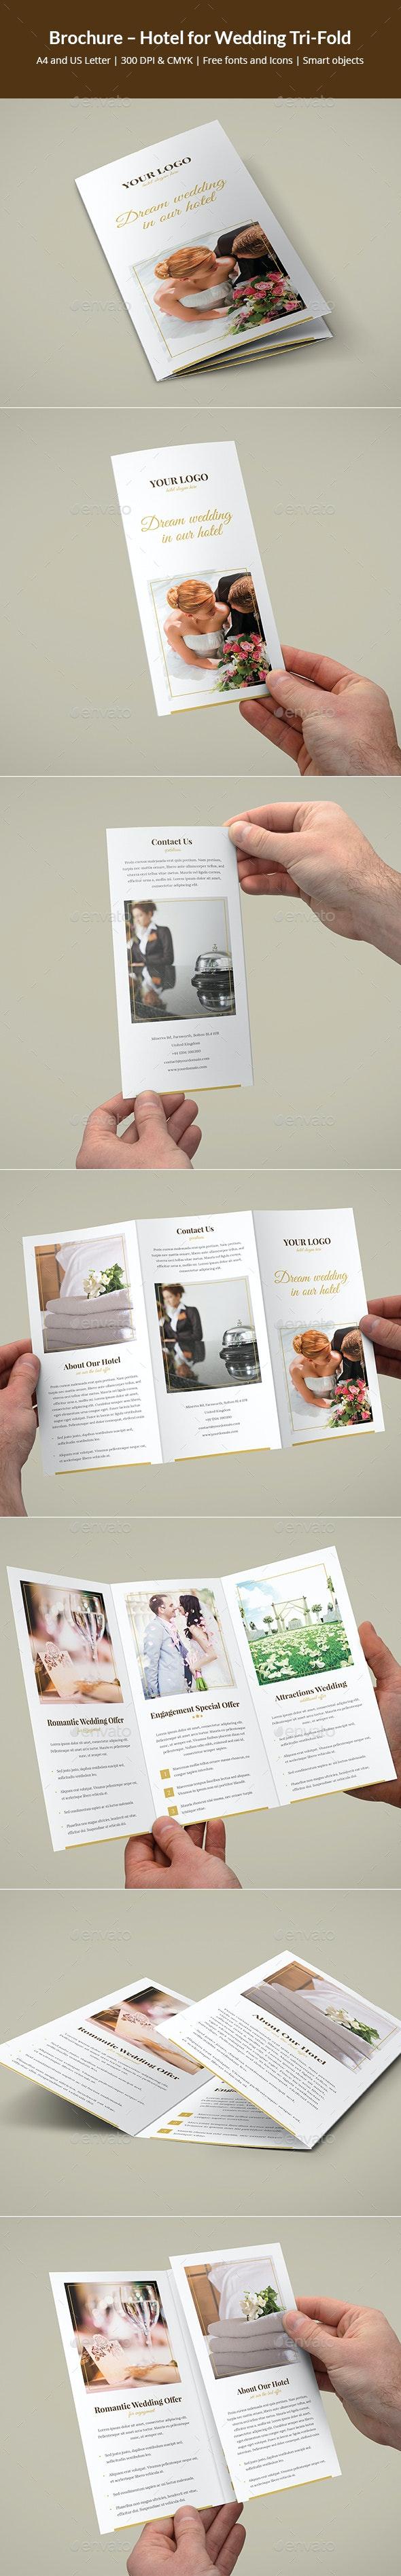 Brochure – Hotel for Wedding Tri-Fold - Corporate Brochures